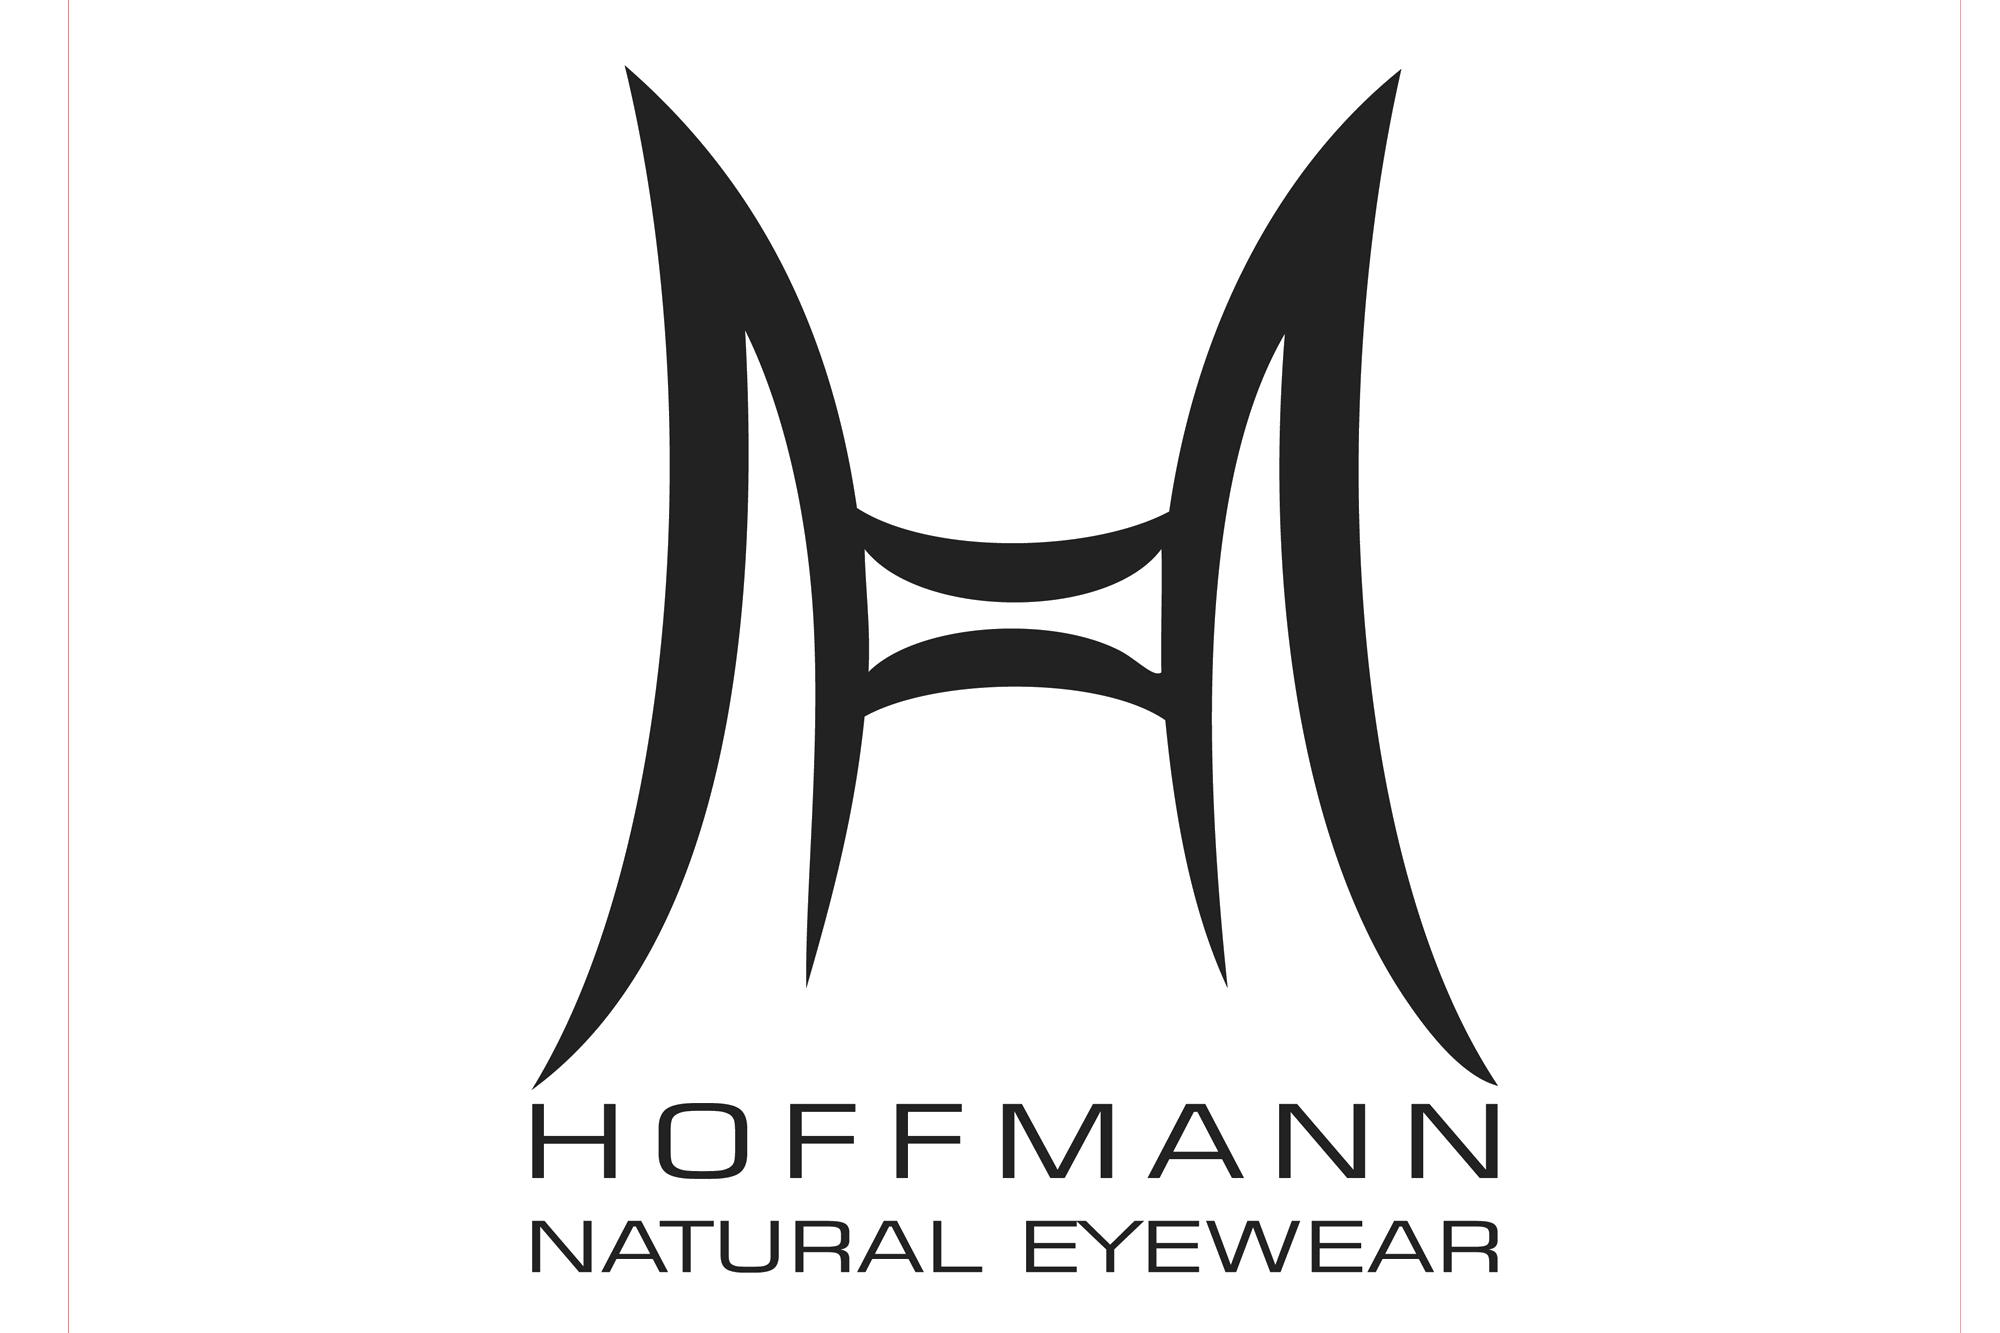 Hoffmann, Natural Eyewear